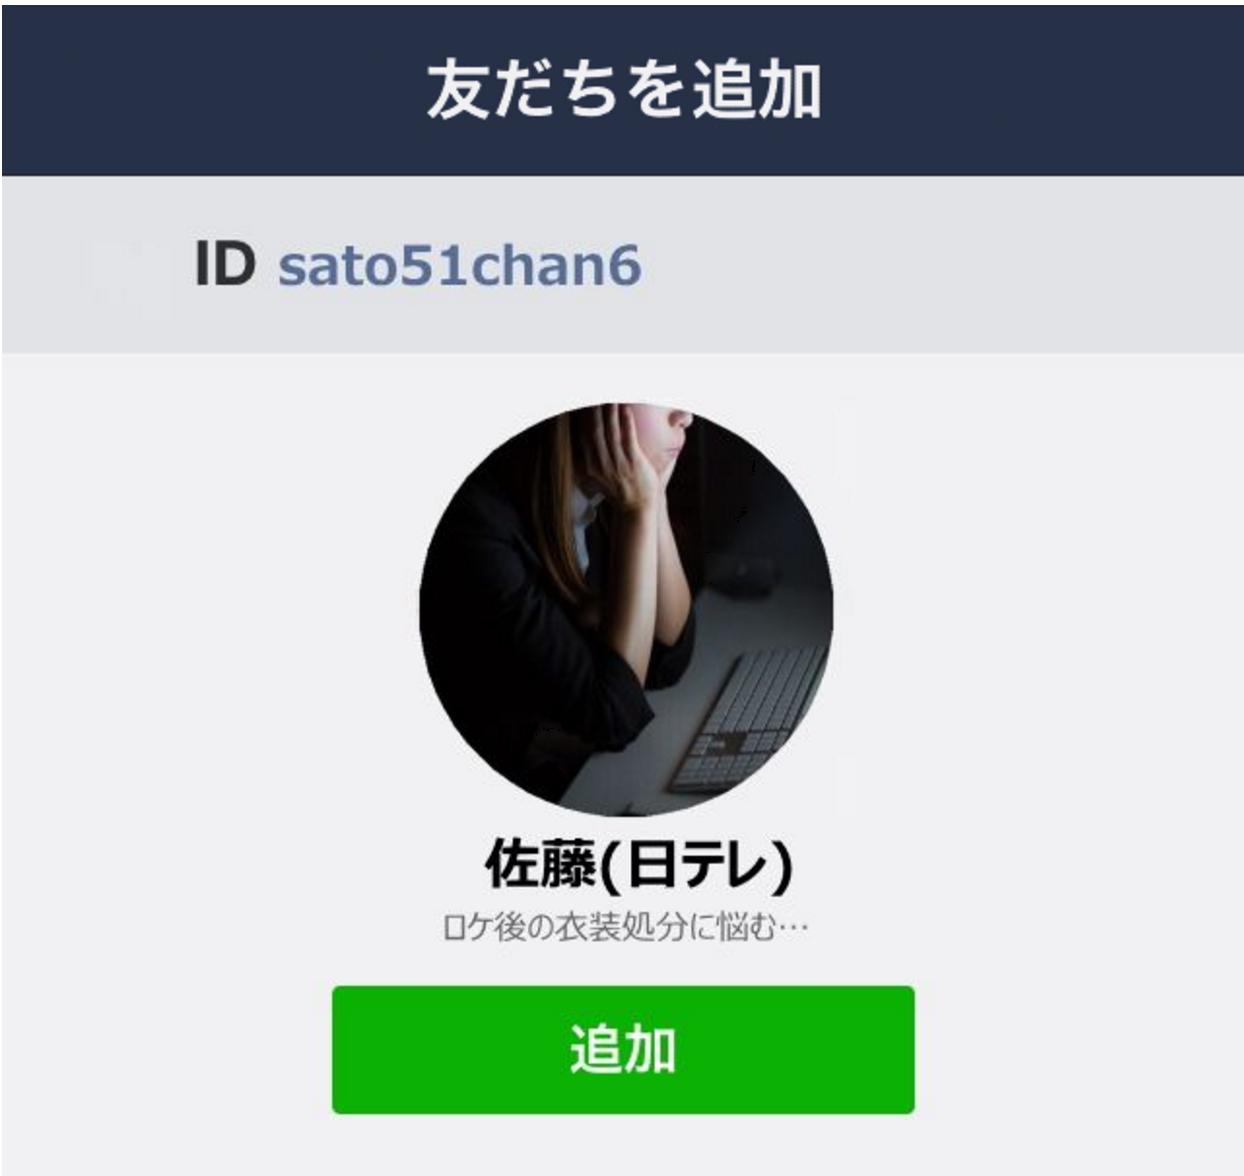 naver-line-spam-sato51chan6